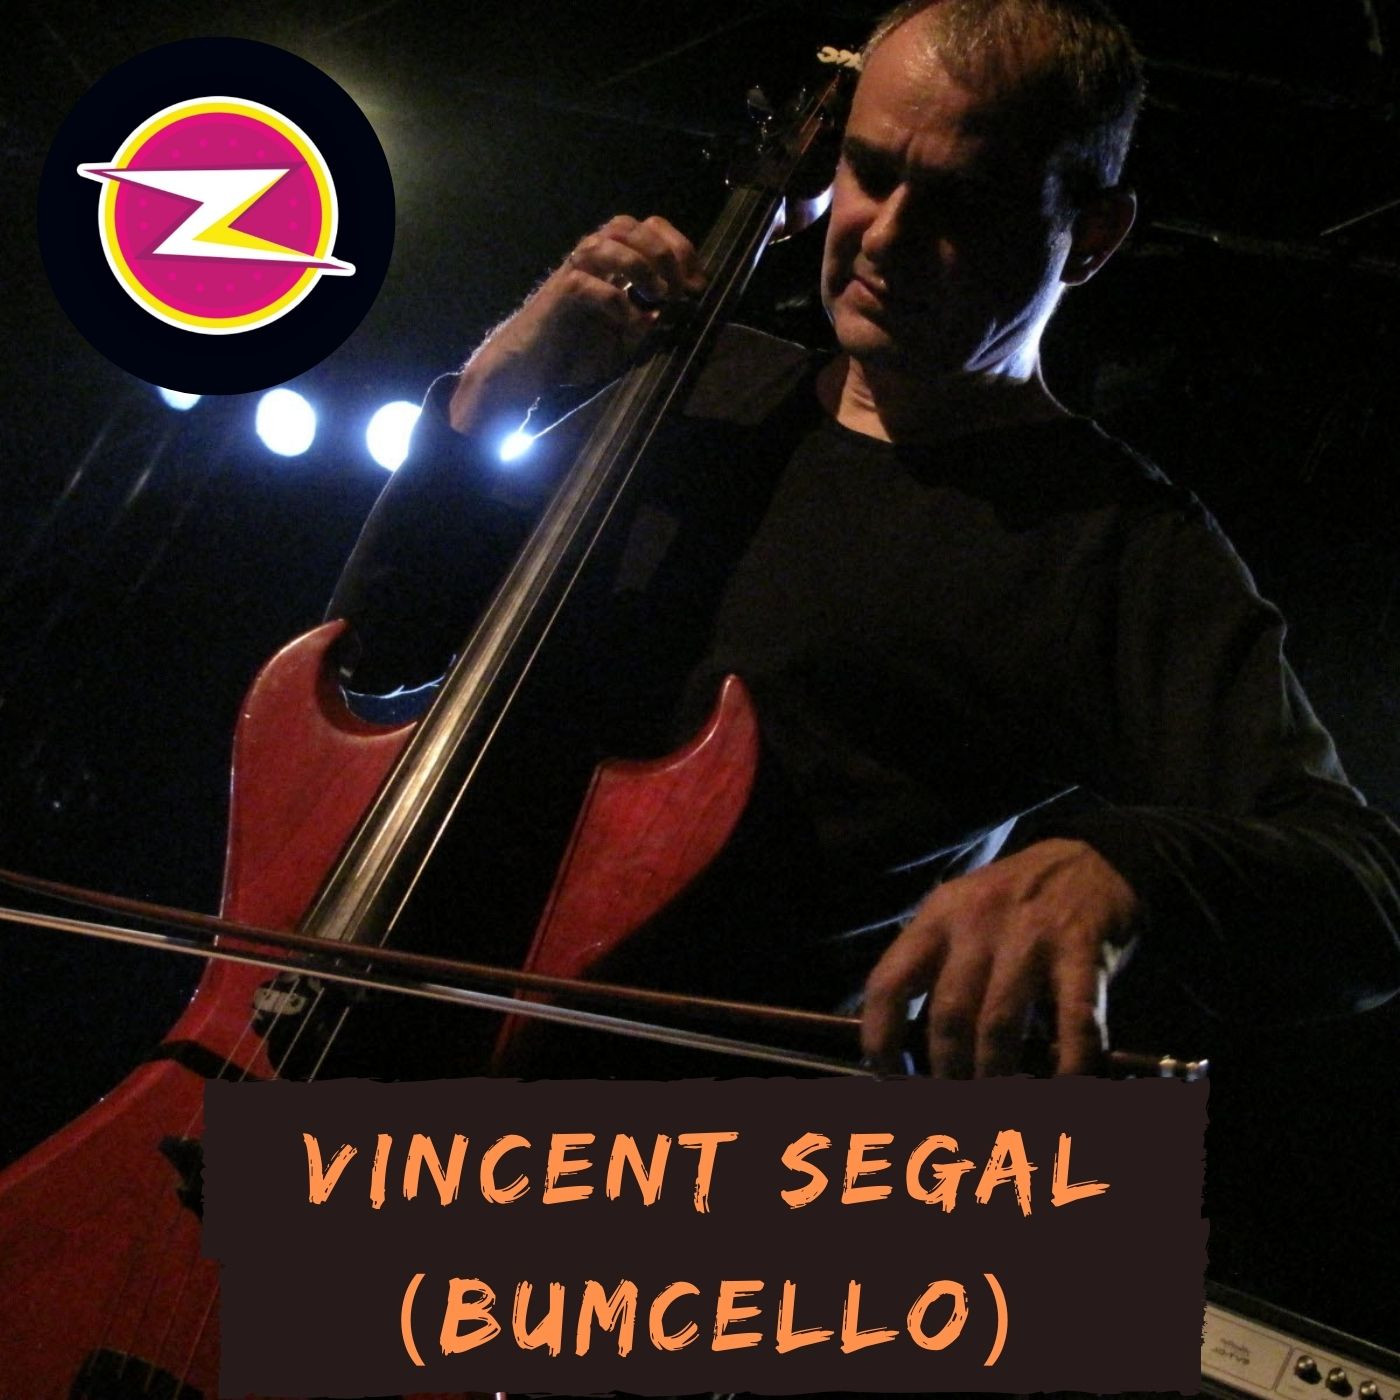 Bumcello - Vincent Segal